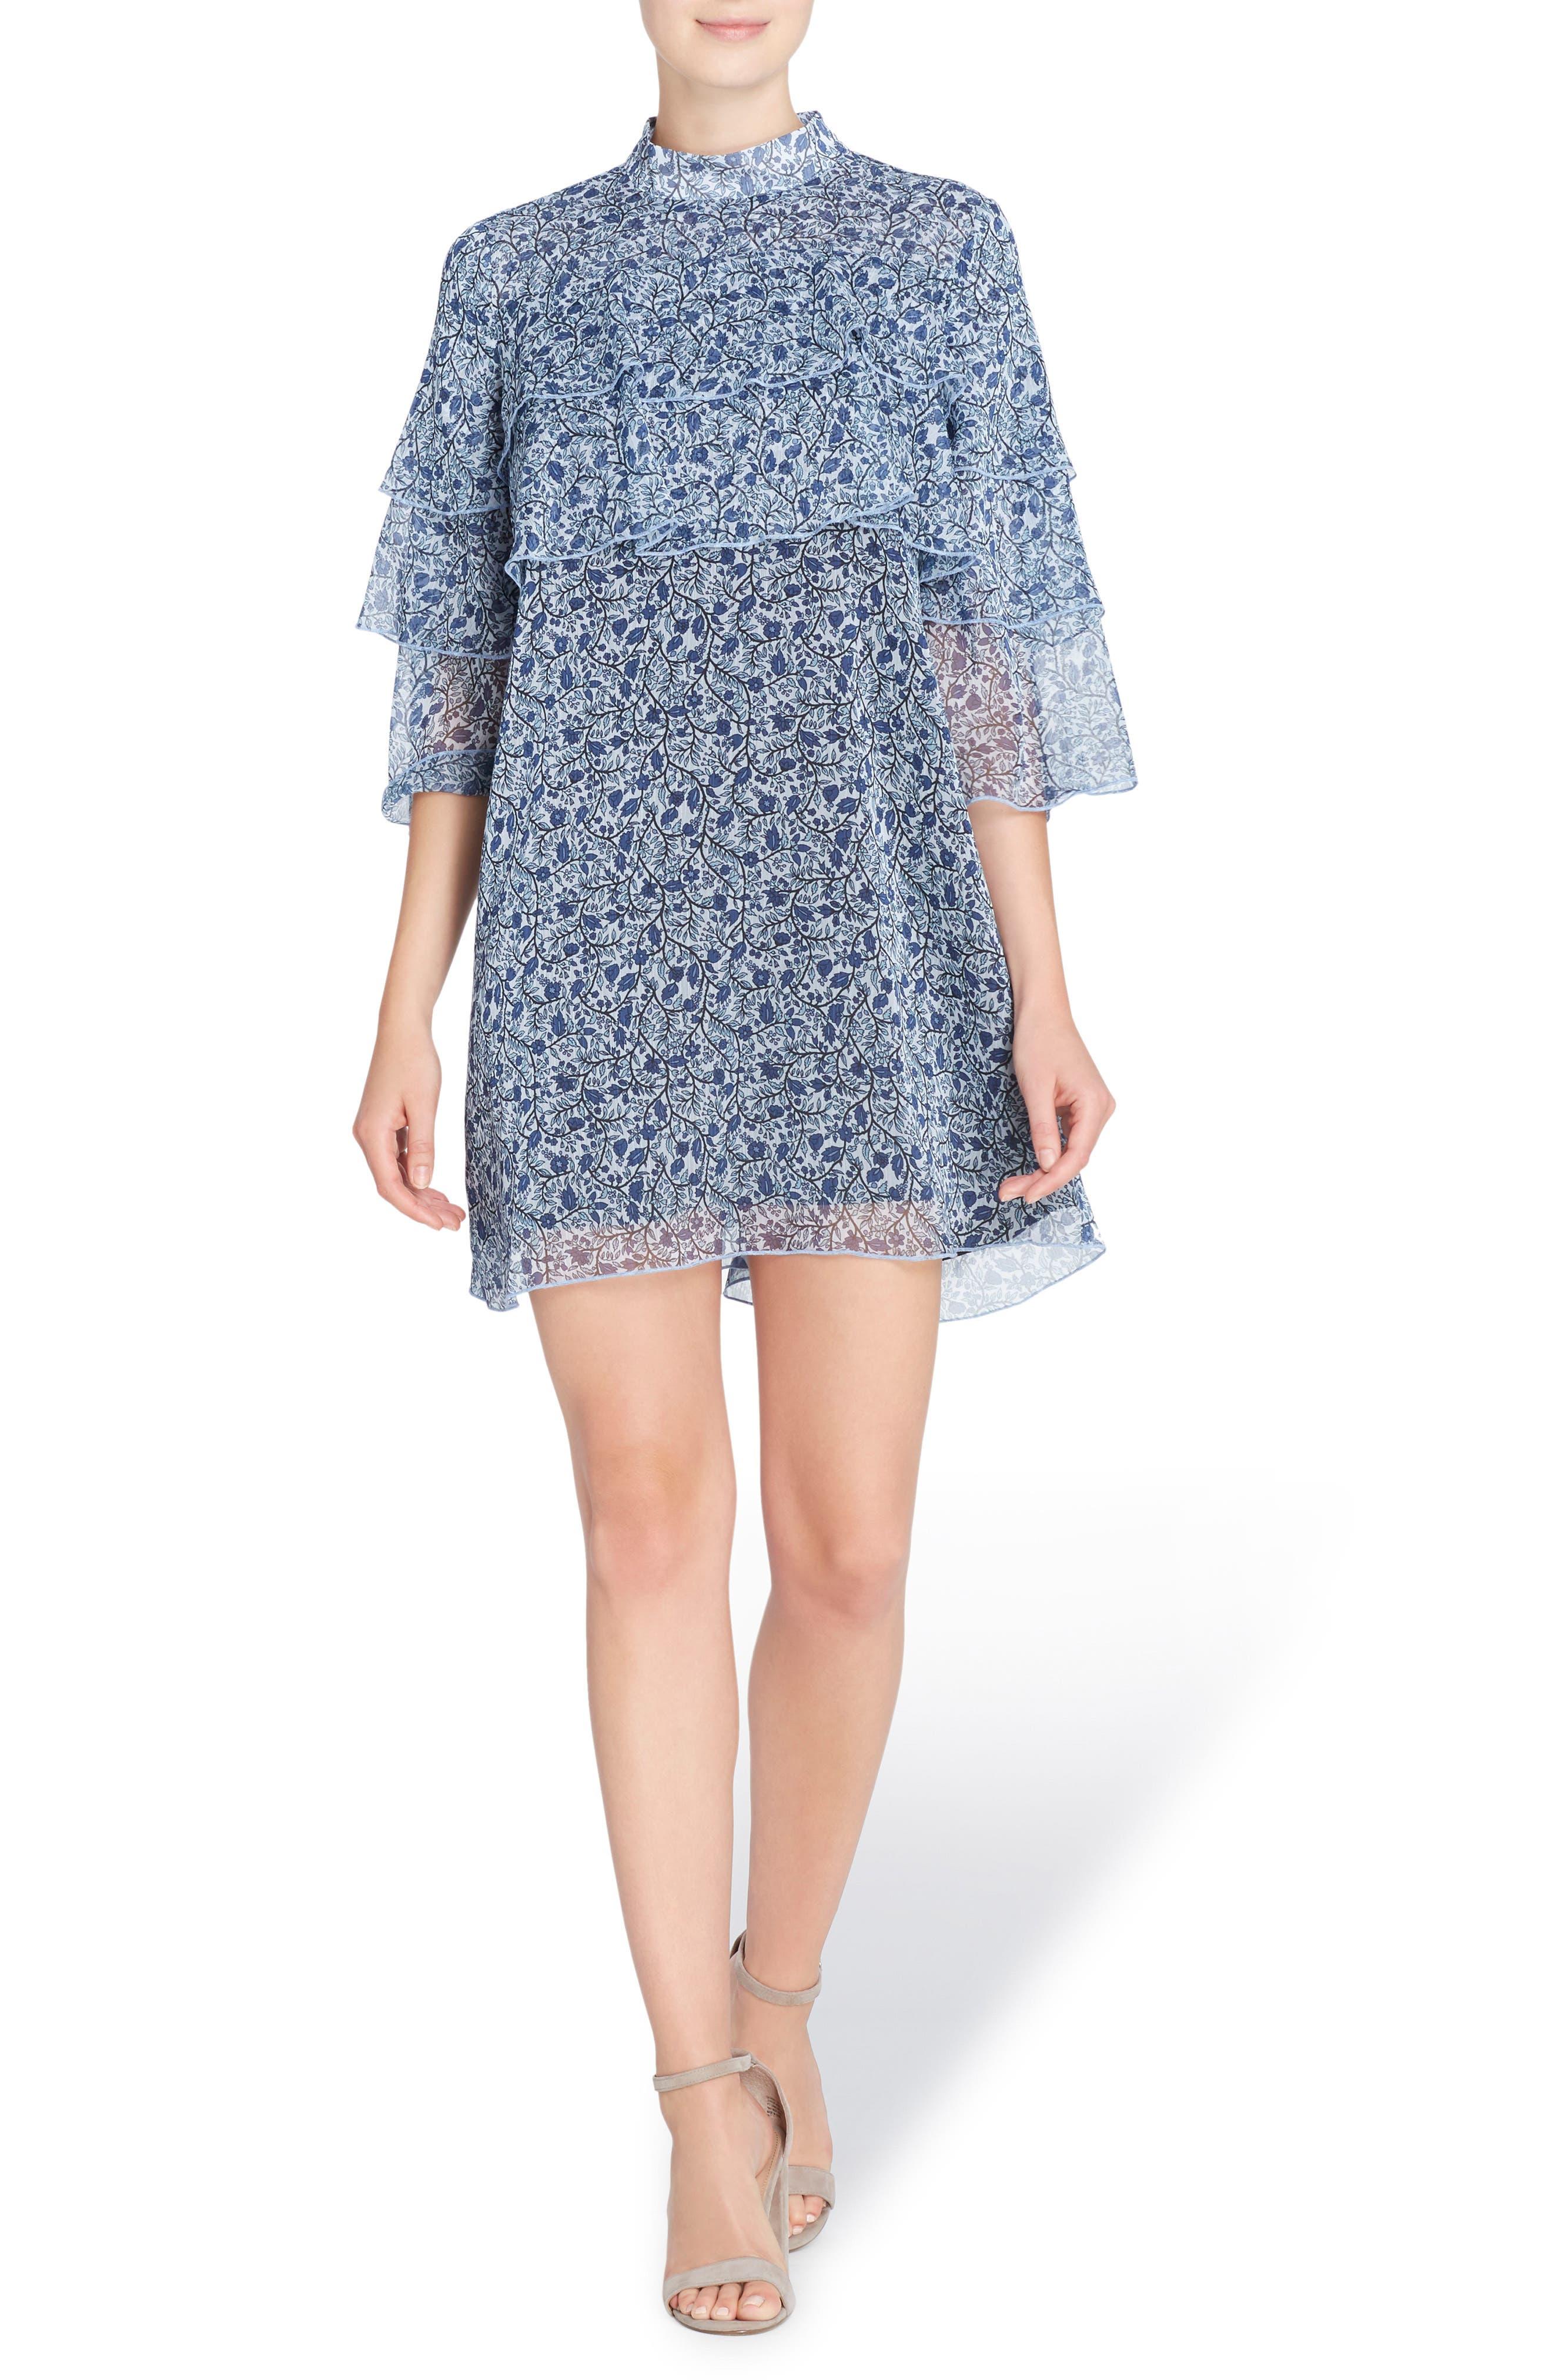 Main Image - Catherine Catherine Malandrino Cass Print Chiffon Dress